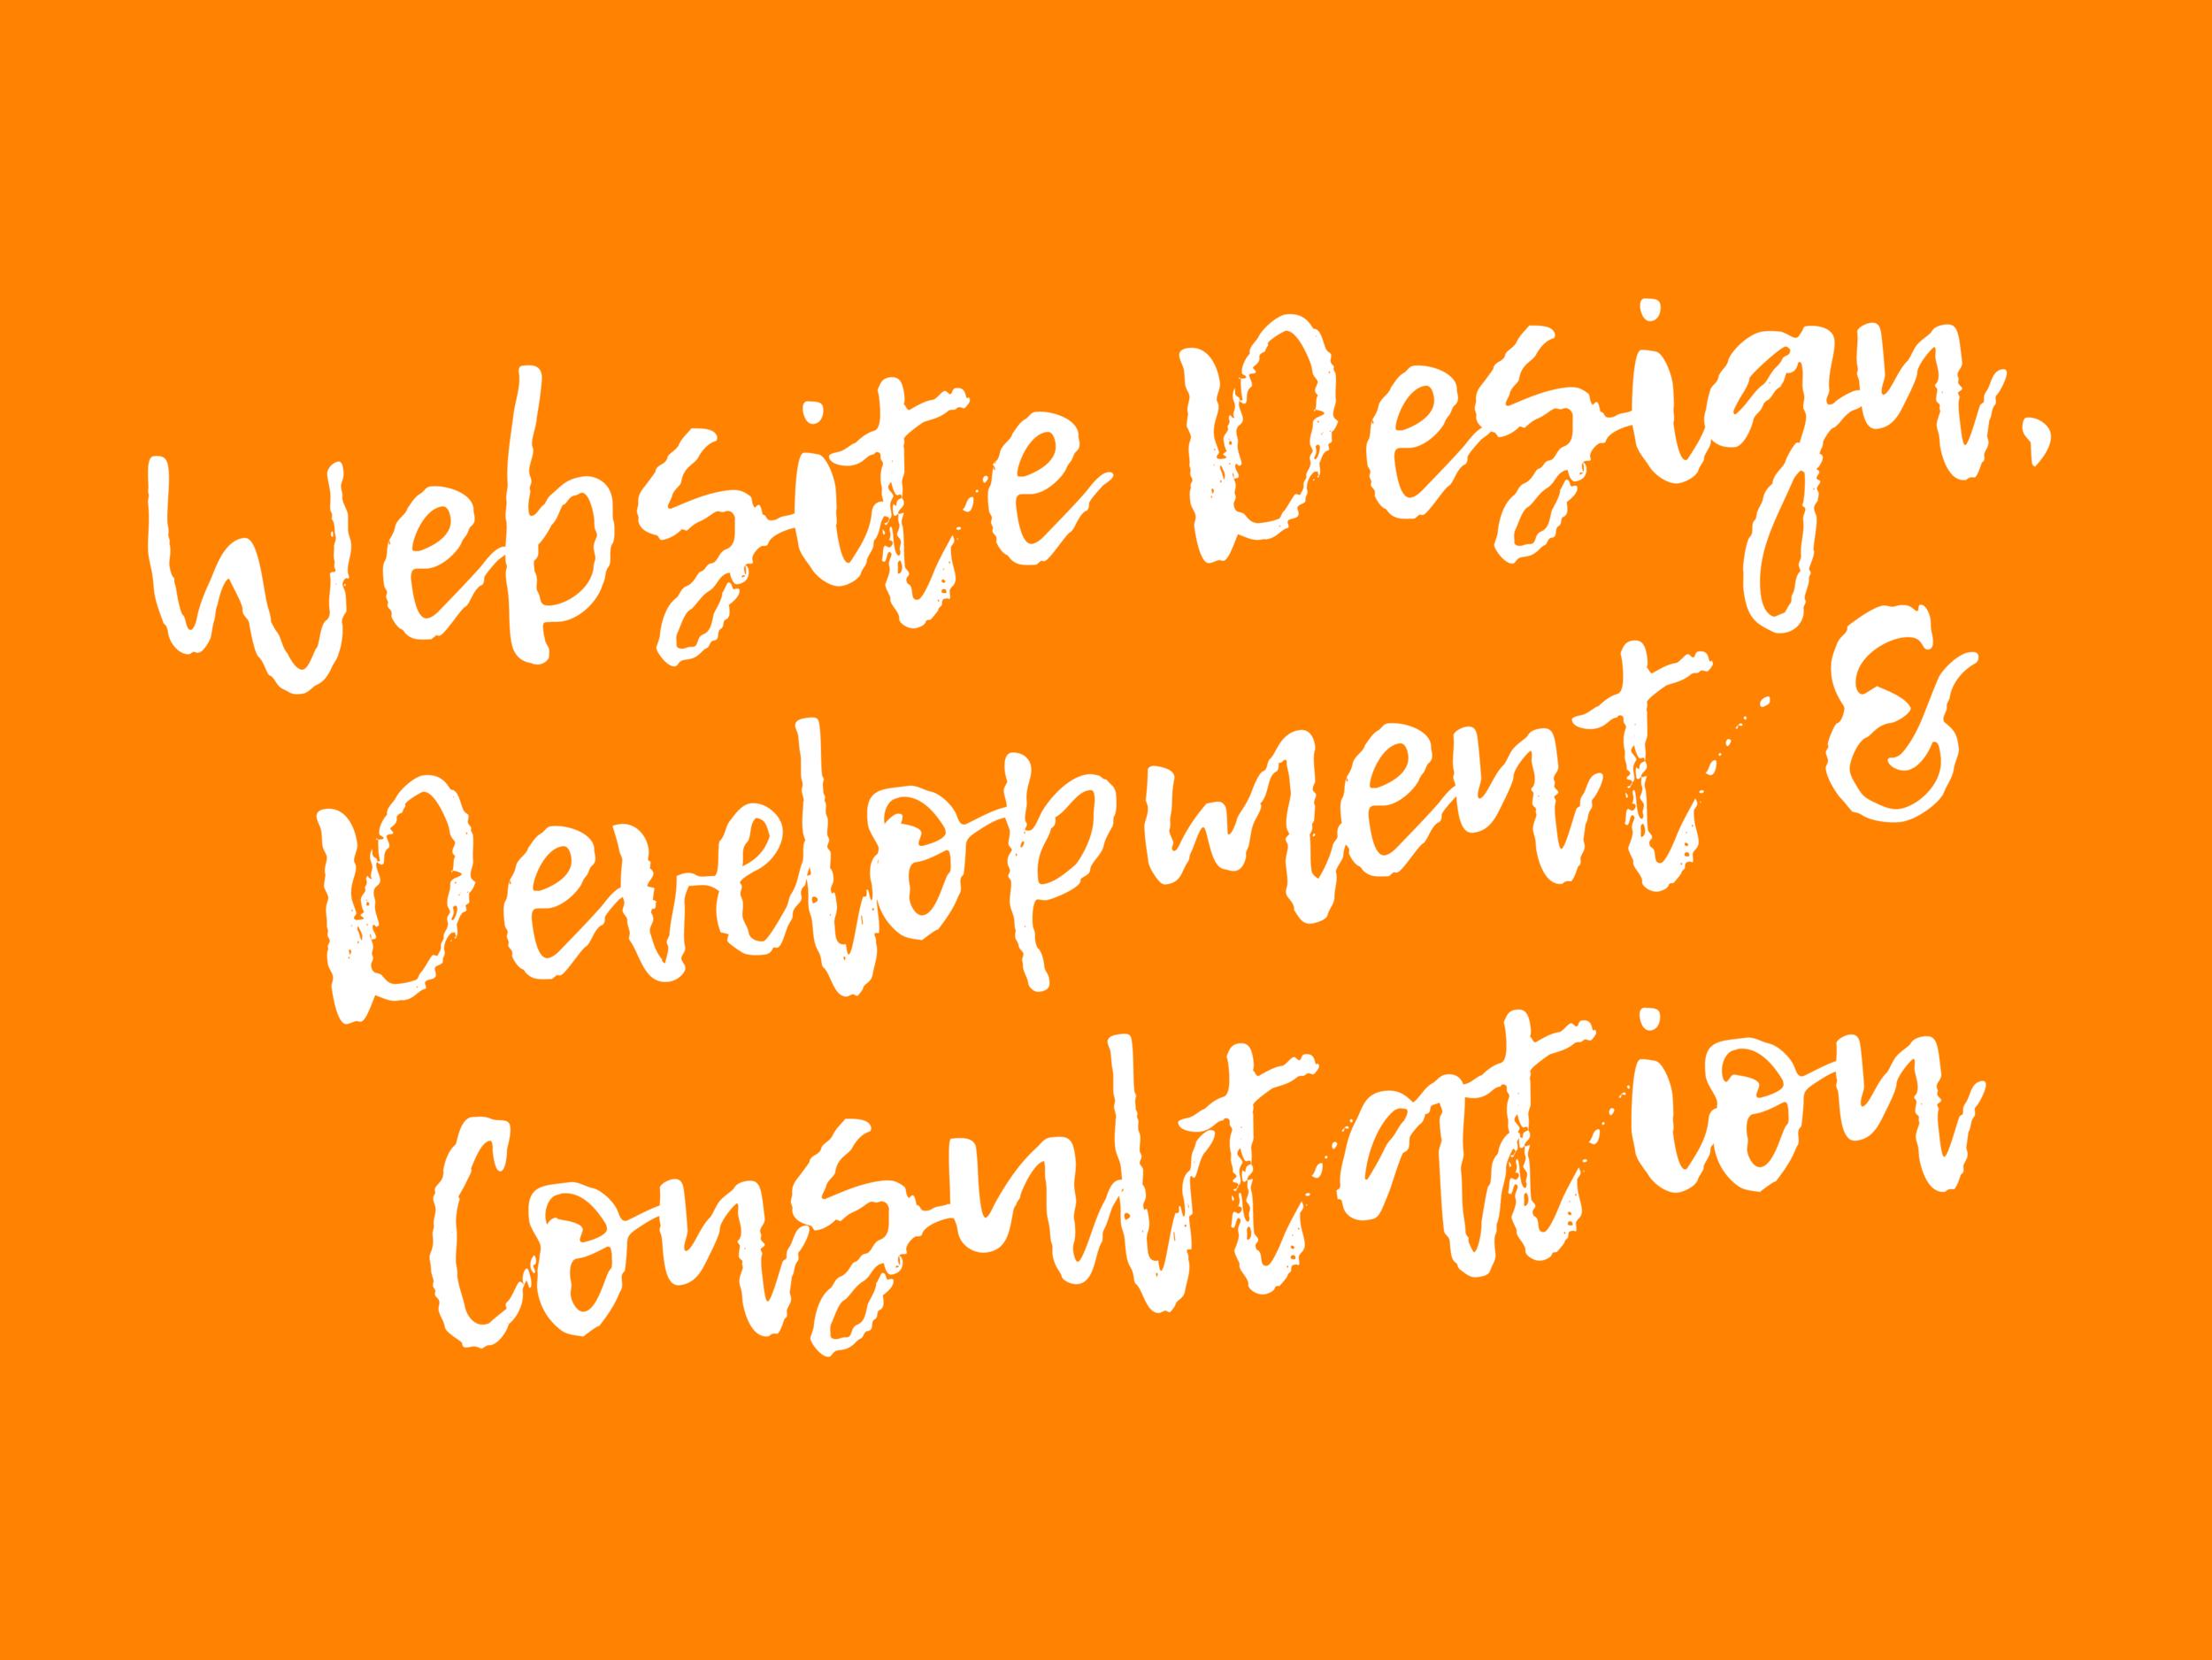 BUY-FROM CREATIVE AGENCY: WEBSITE DESIGN, DEVELOPMENT & CONSULTATION